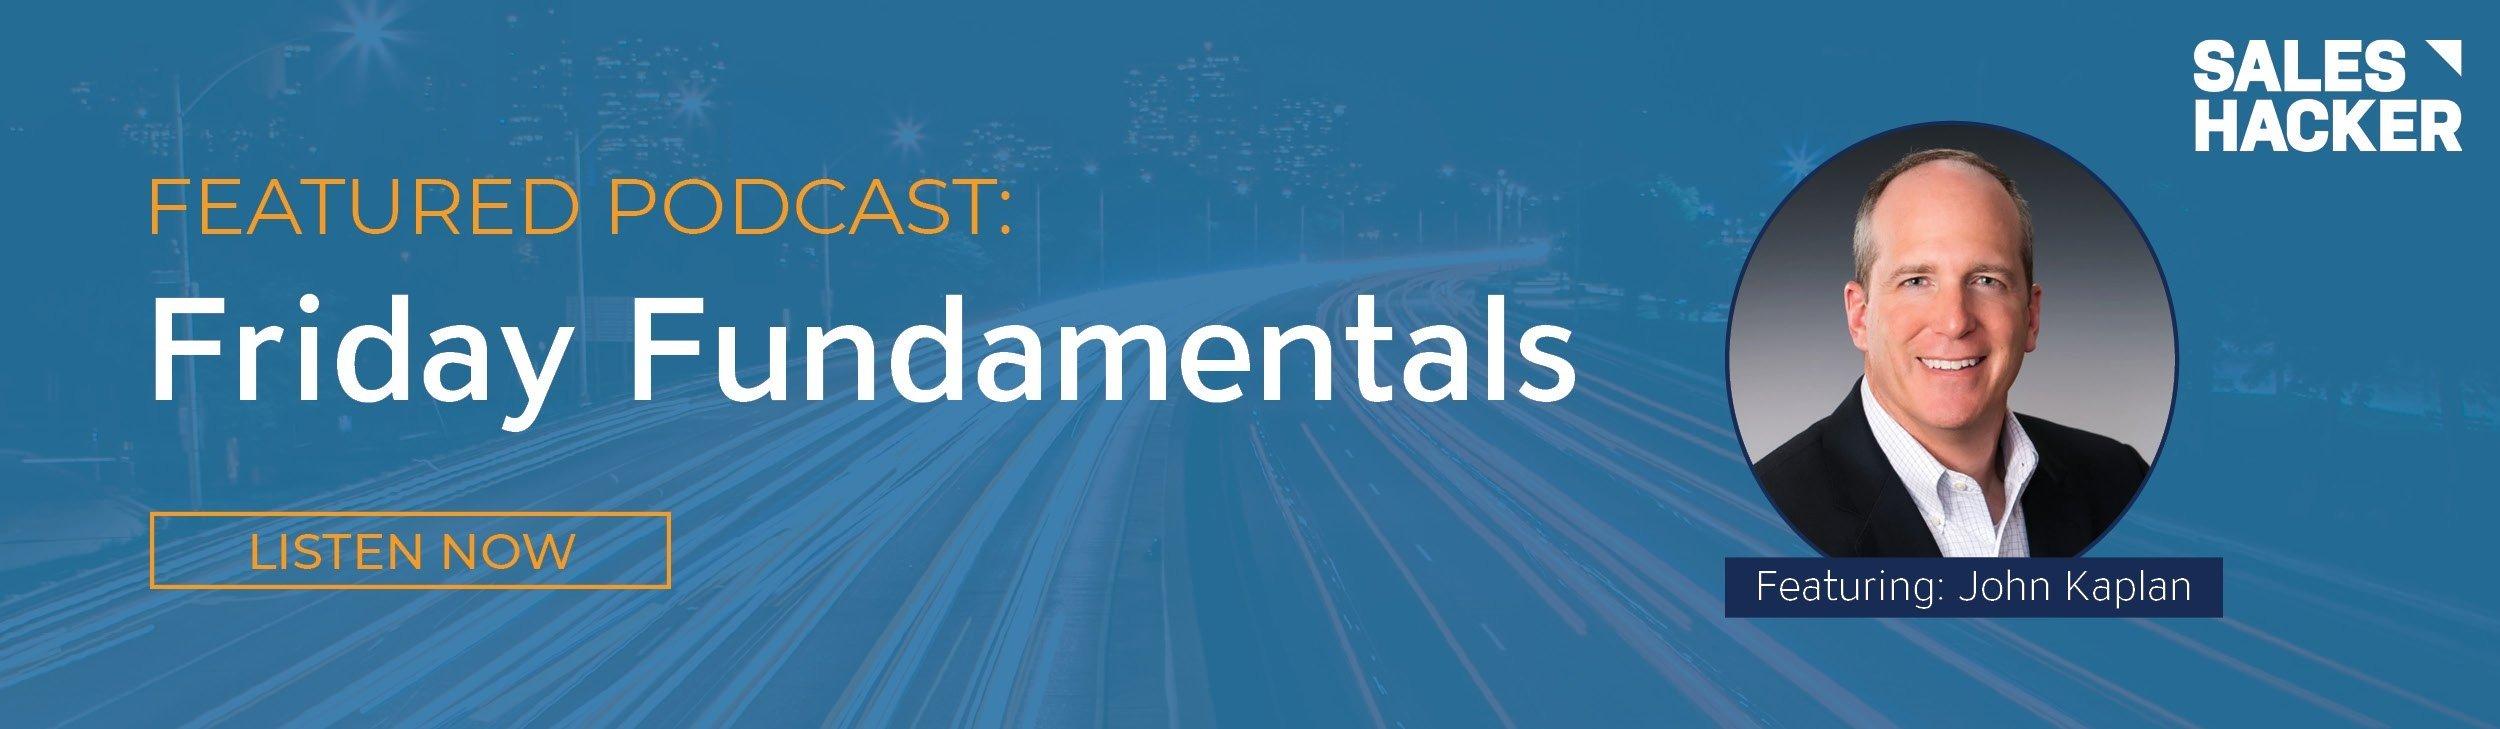 Friday Fundamentals Podcast